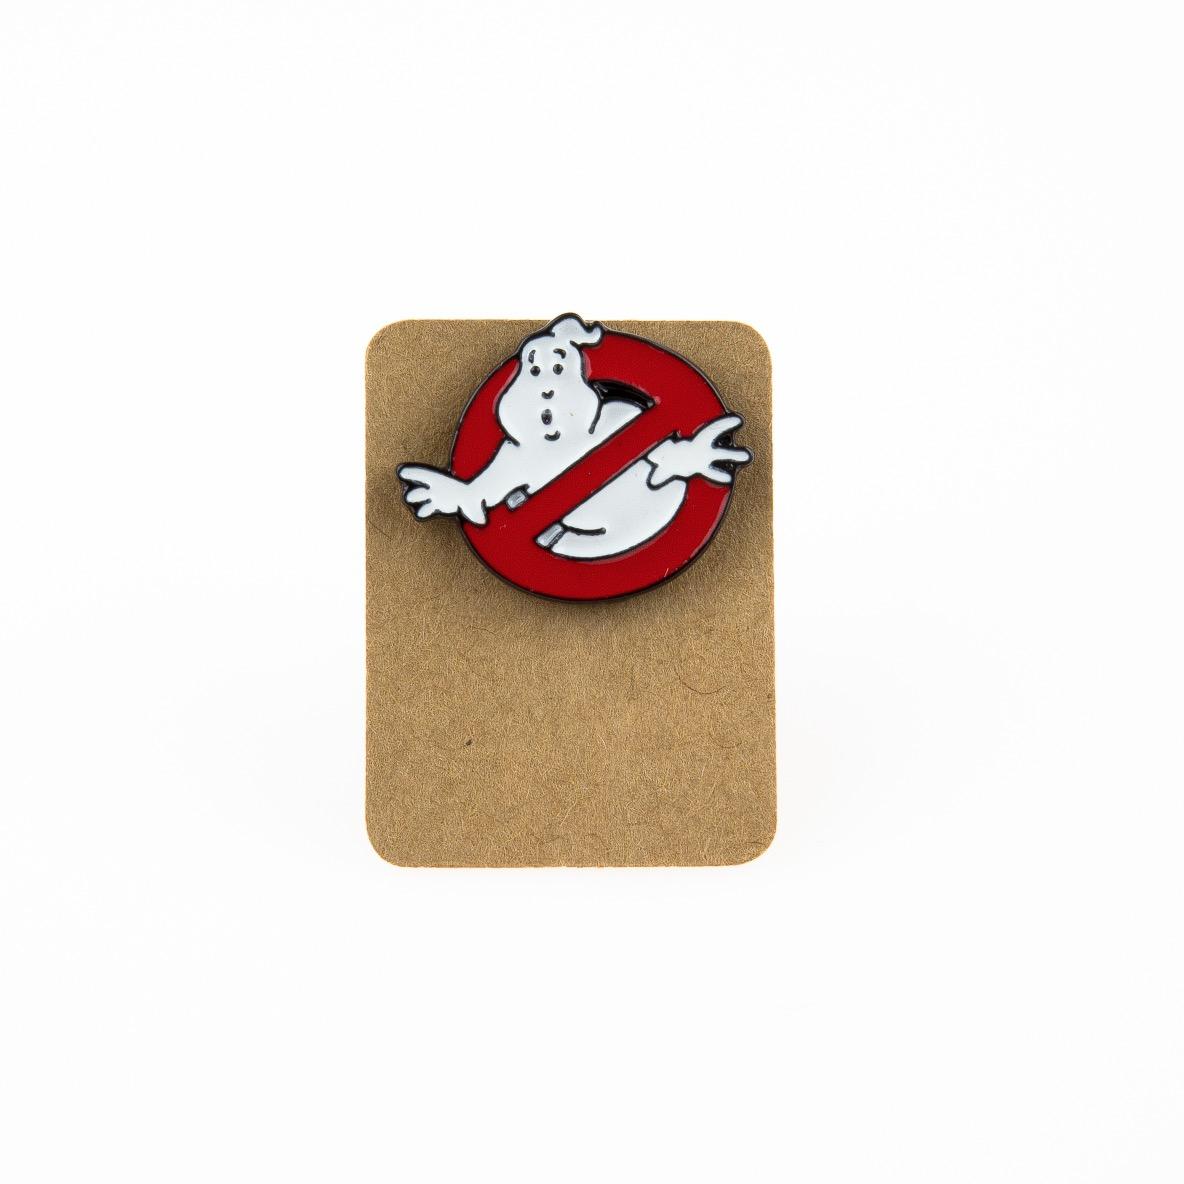 Metal Ghostbuster Enamel Pin Badge